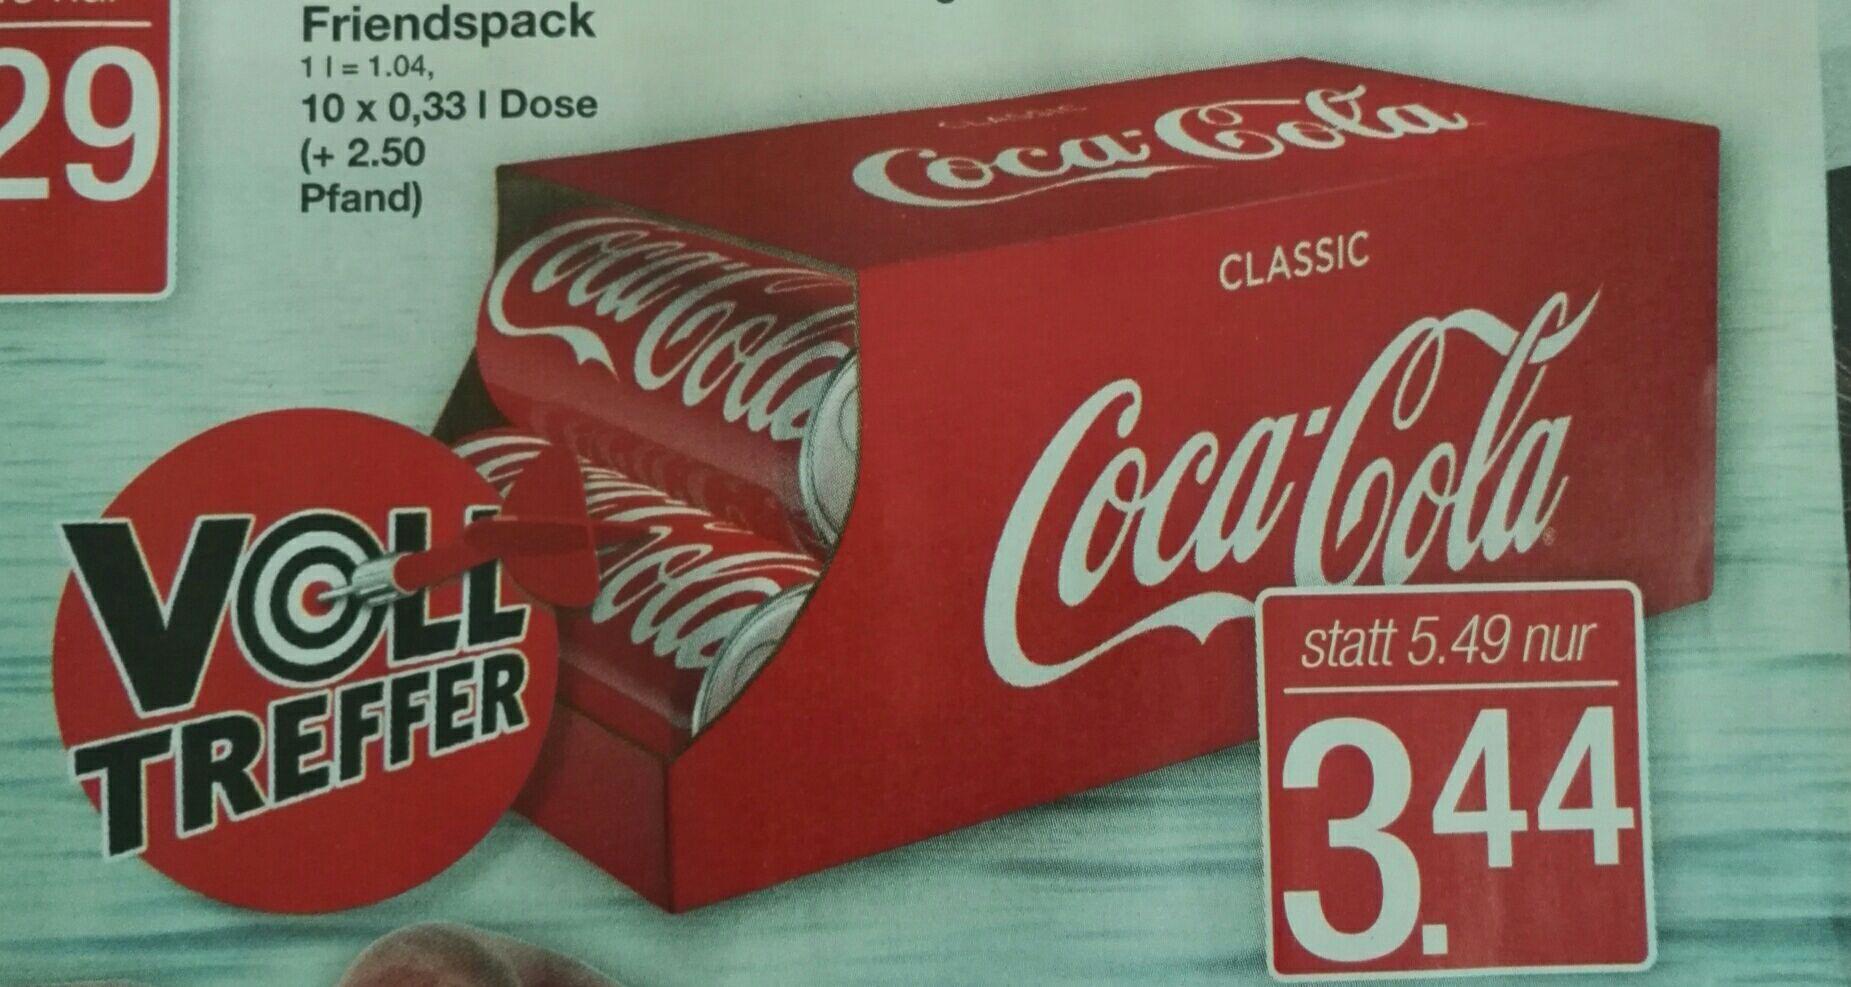 Markant (Lokal?)Coca Cola Friendspack 10x0,33 l Dose für 3,44€ zzgl. Pfand!